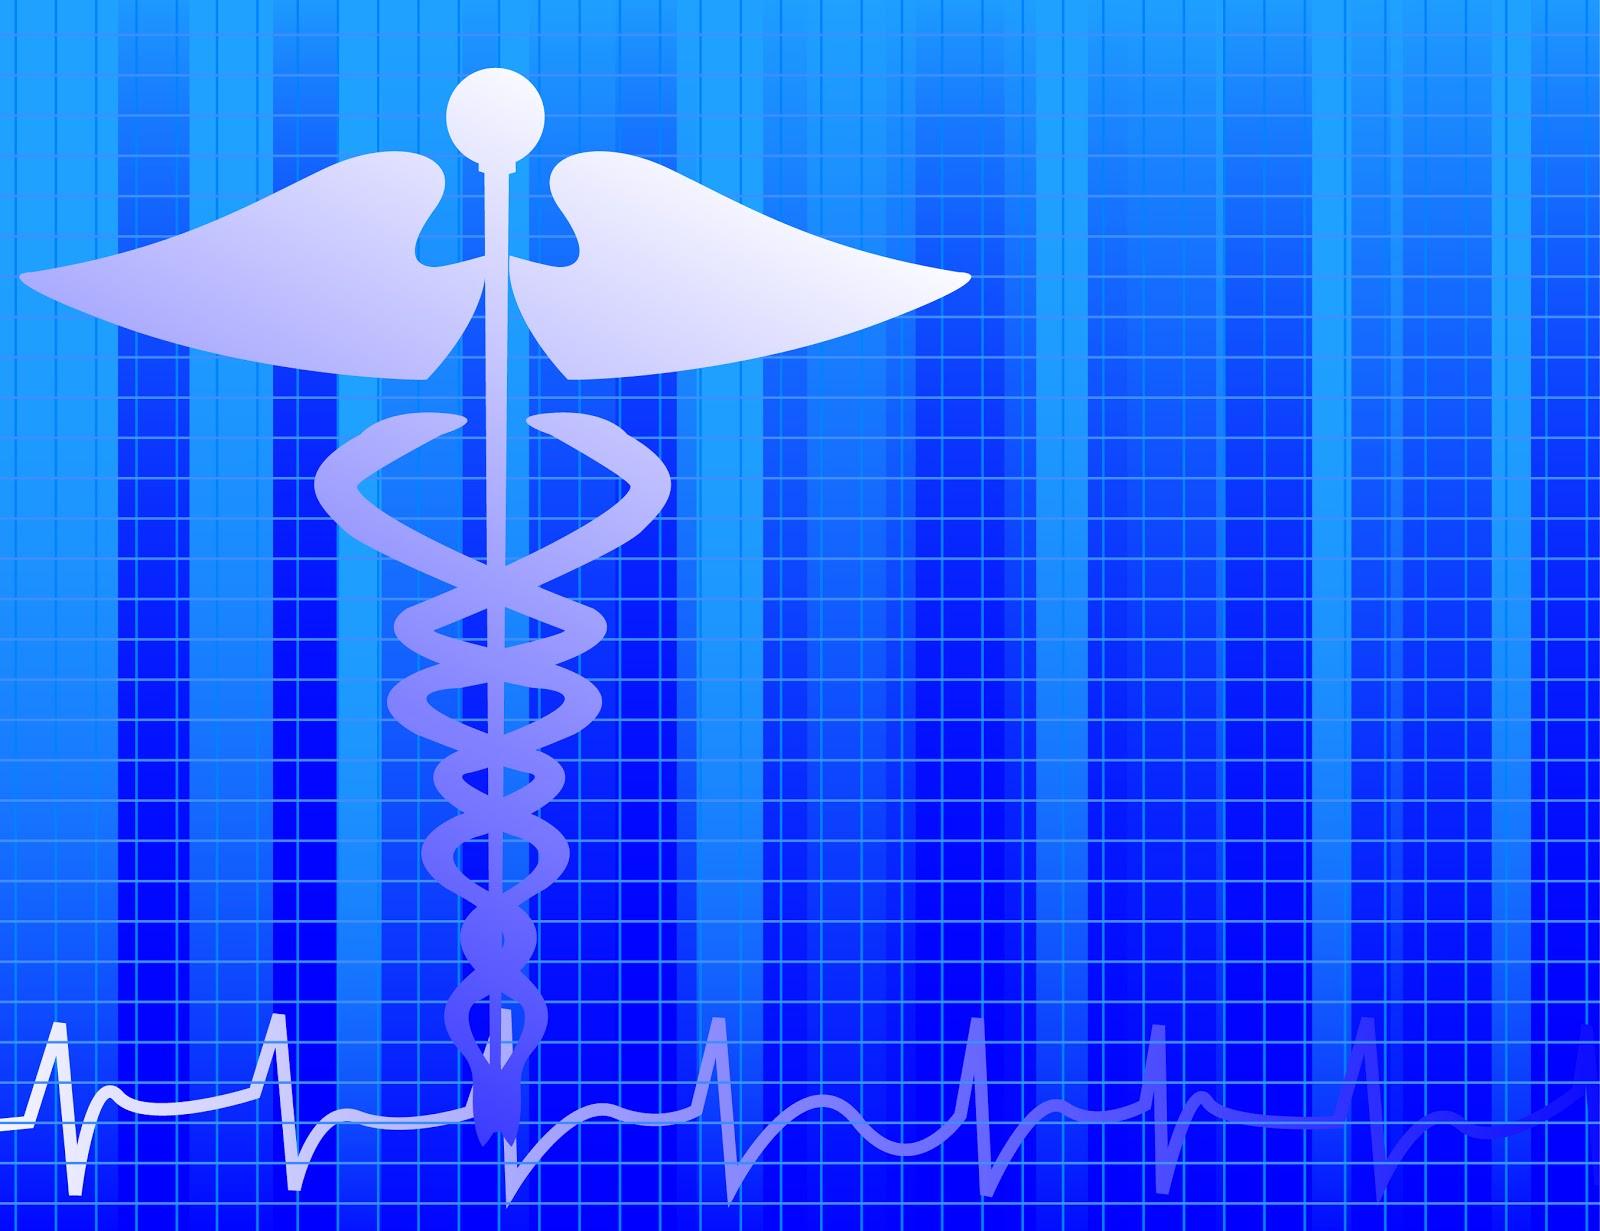 Medical Wallpaper Powerpoint Medical Background Design